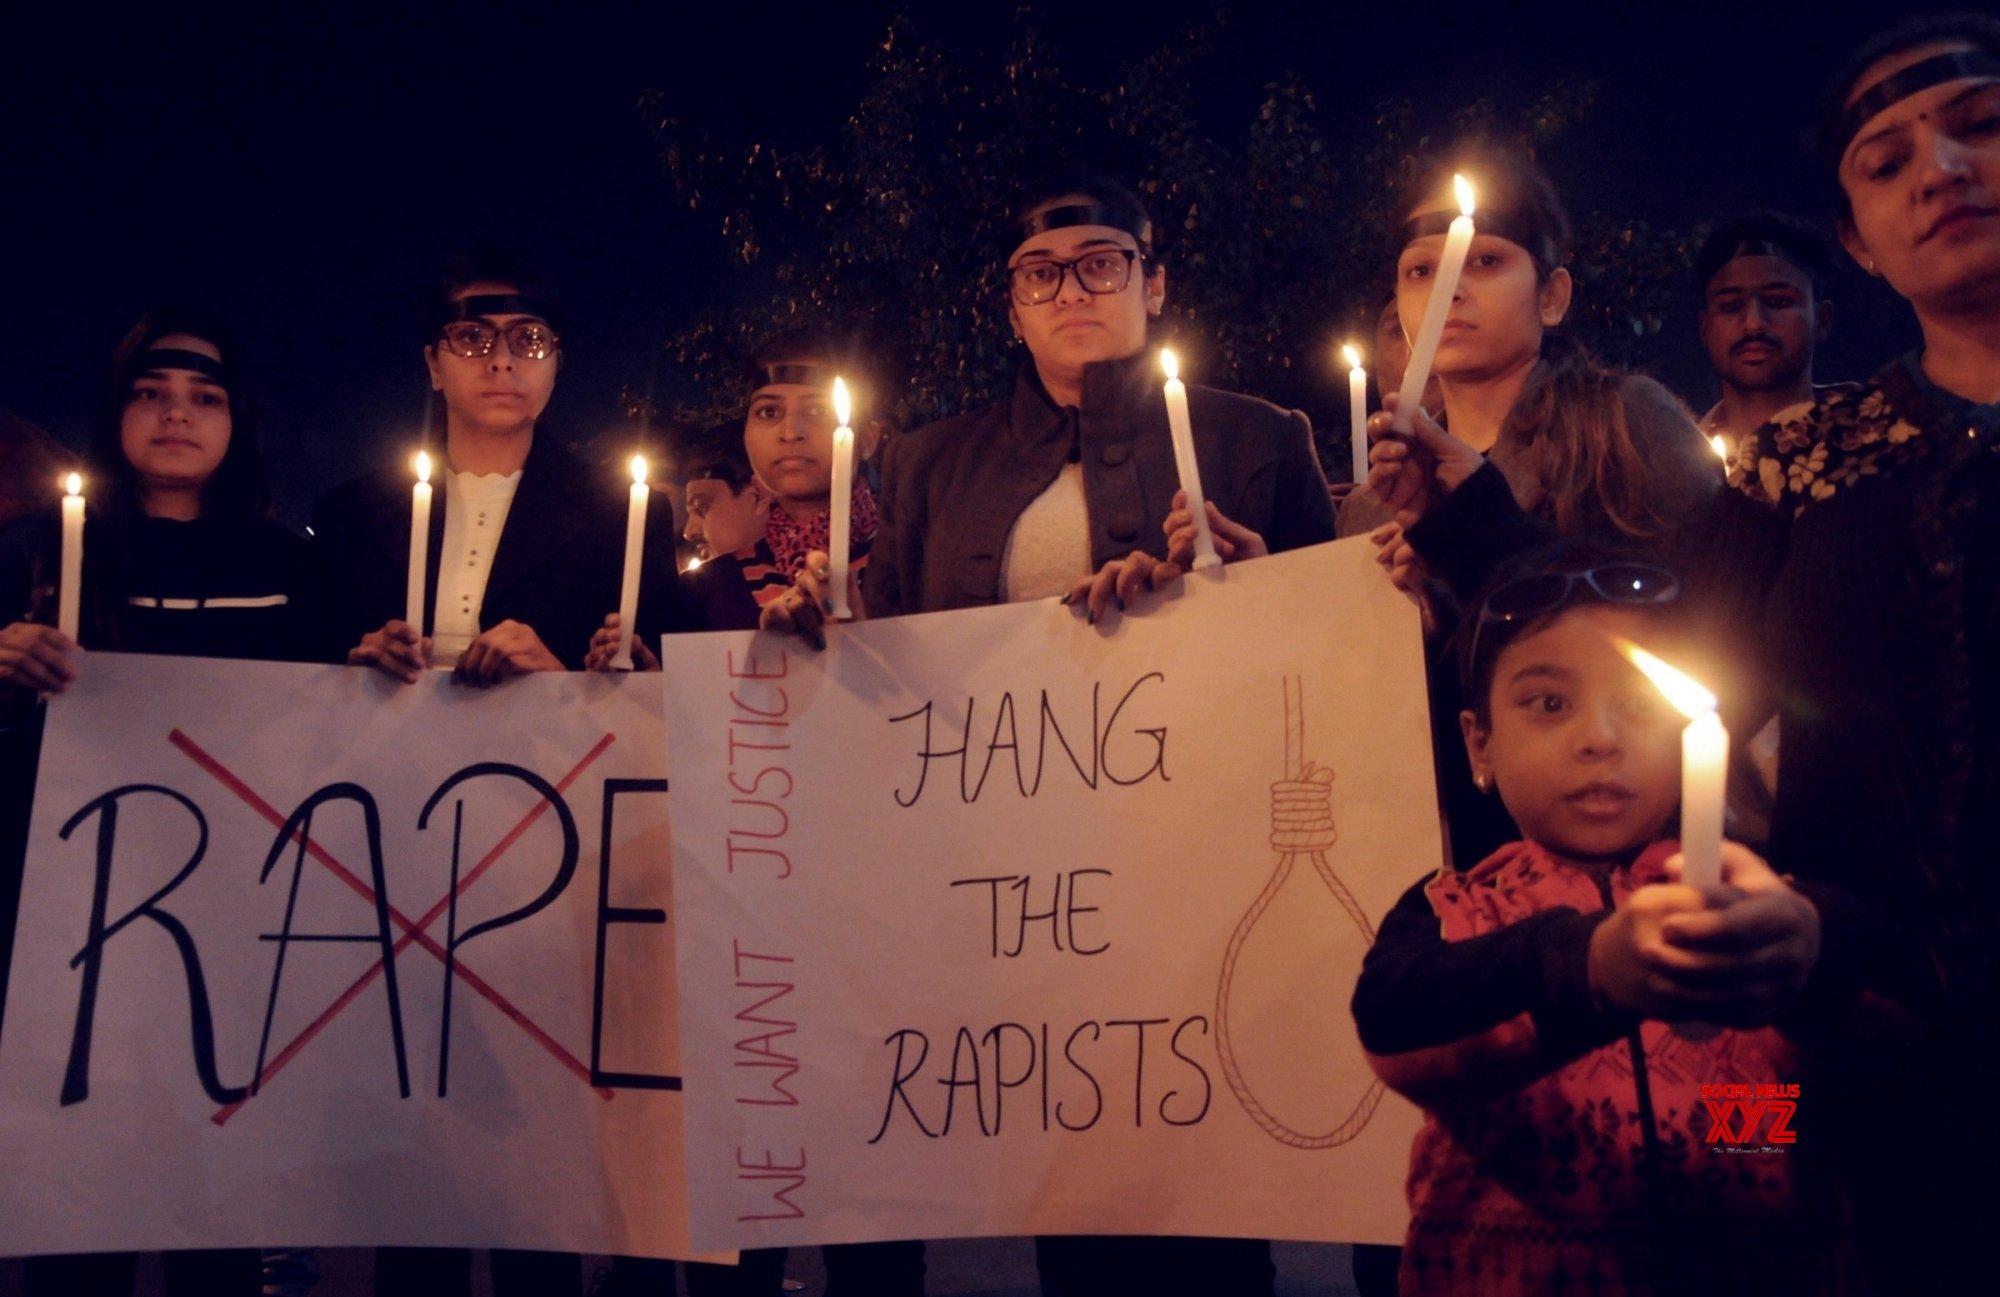 Amritsar: Hyderabad gang rape - murder - People take out candlelight vigil #Gallery